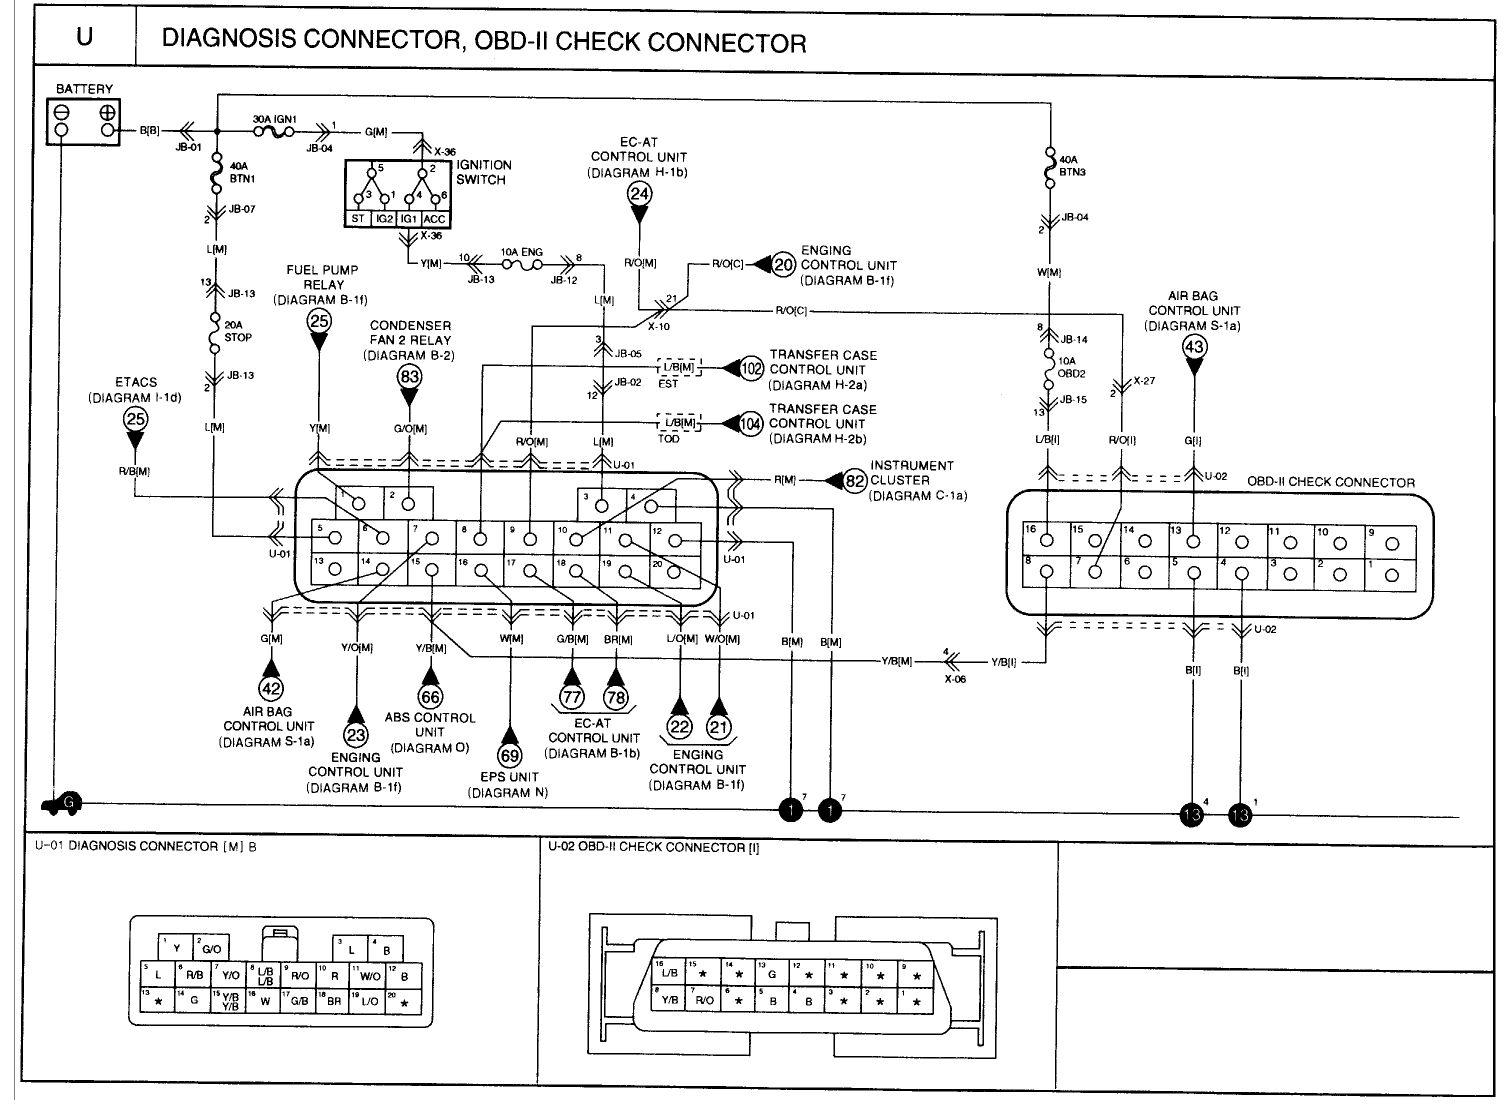 2006 kia sorento wiring diagram pioneer deh 2800mp remote keyless entry - forum